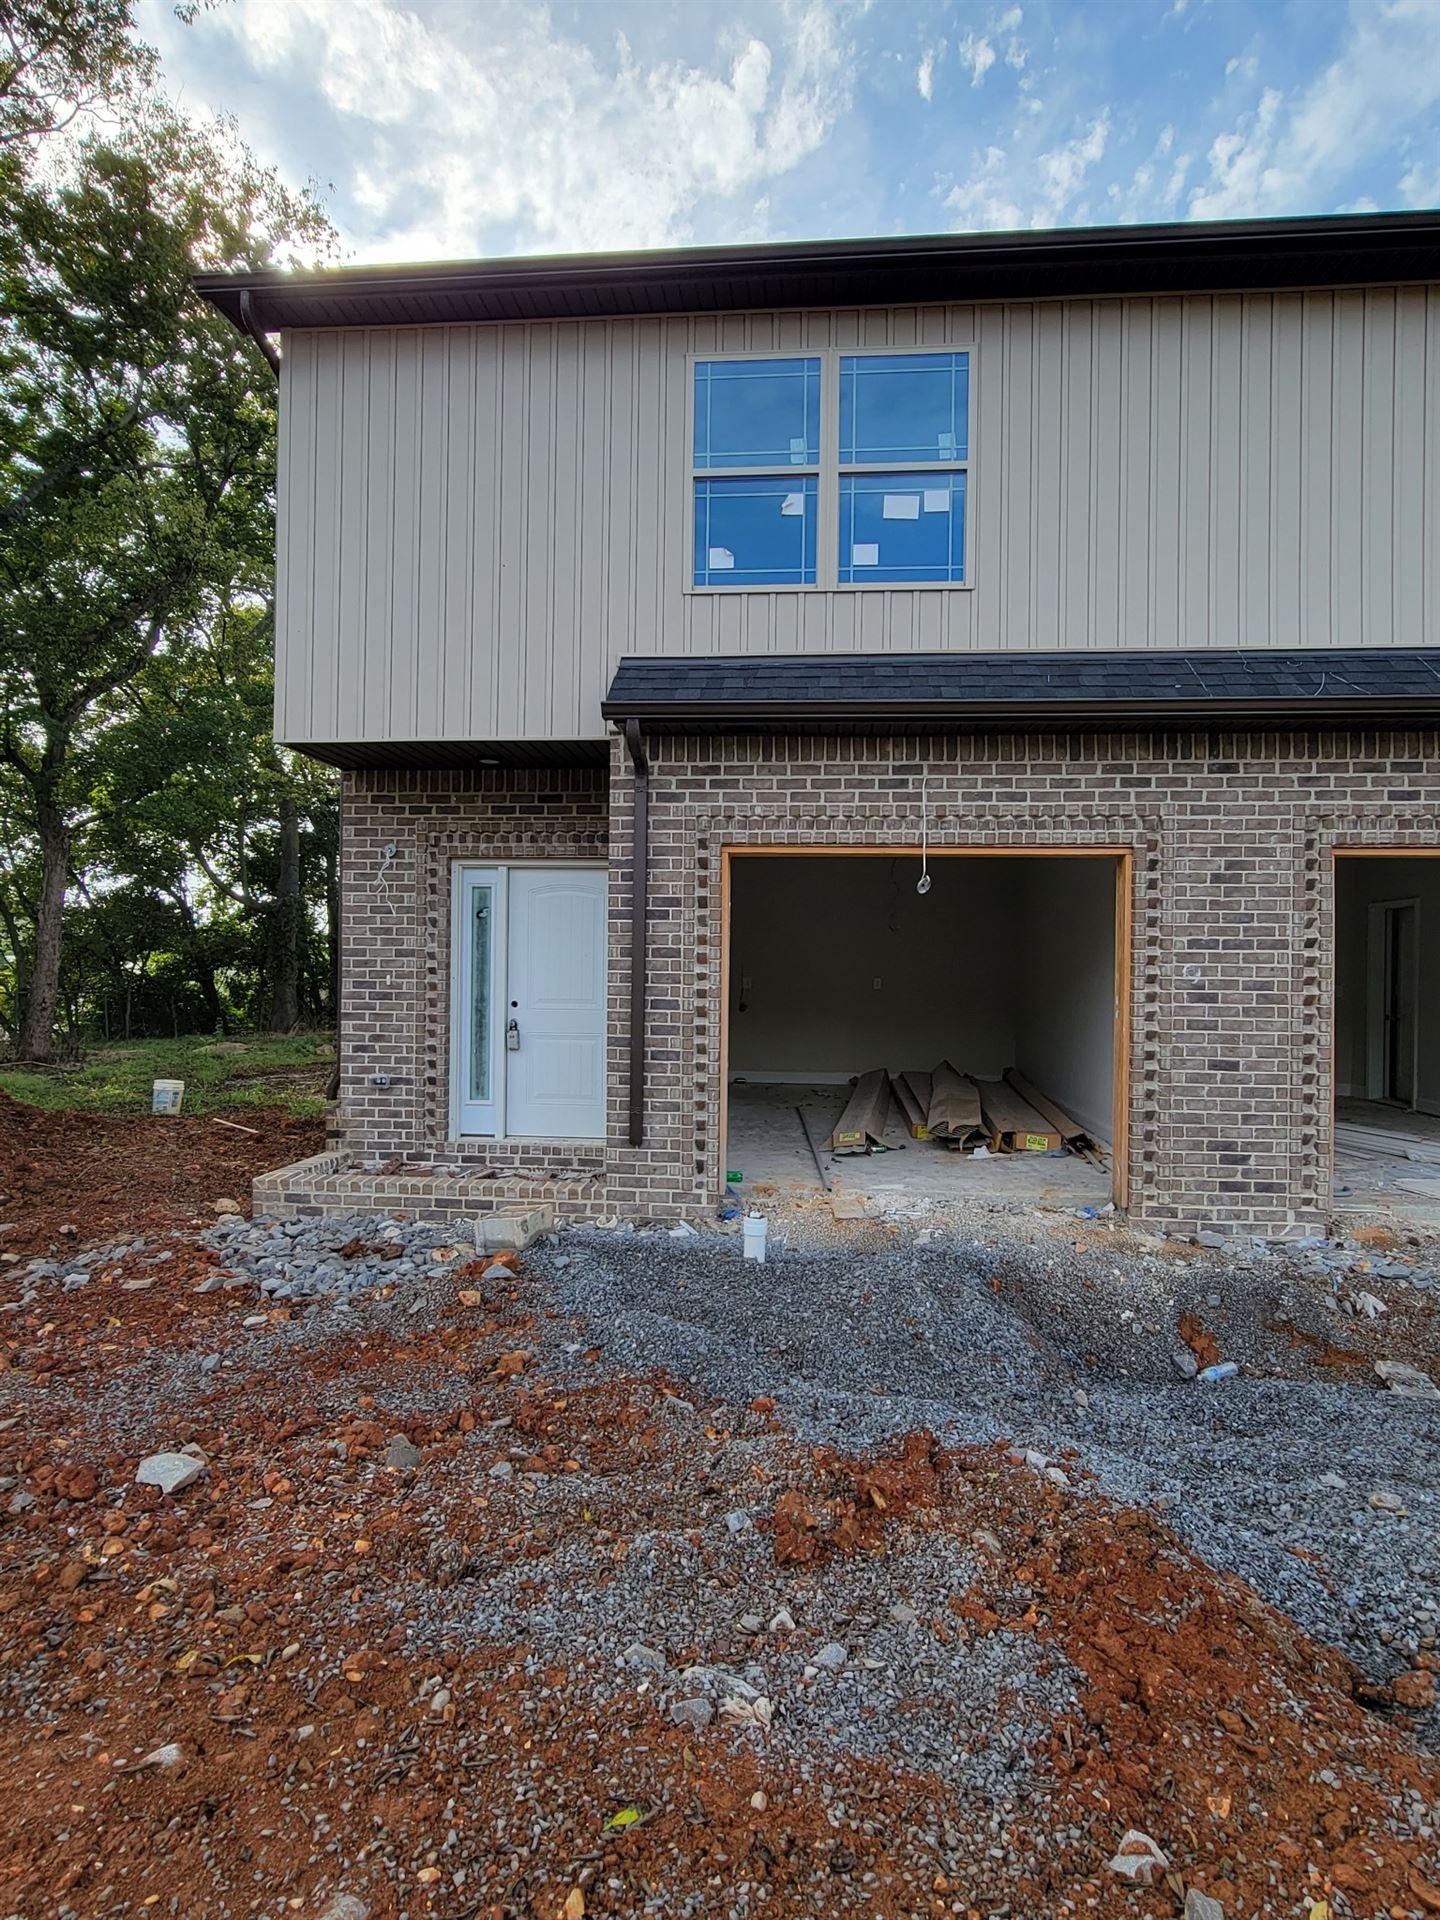 402 Shelby St #A, Clarksville, TN 37042 - MLS#: 2293279